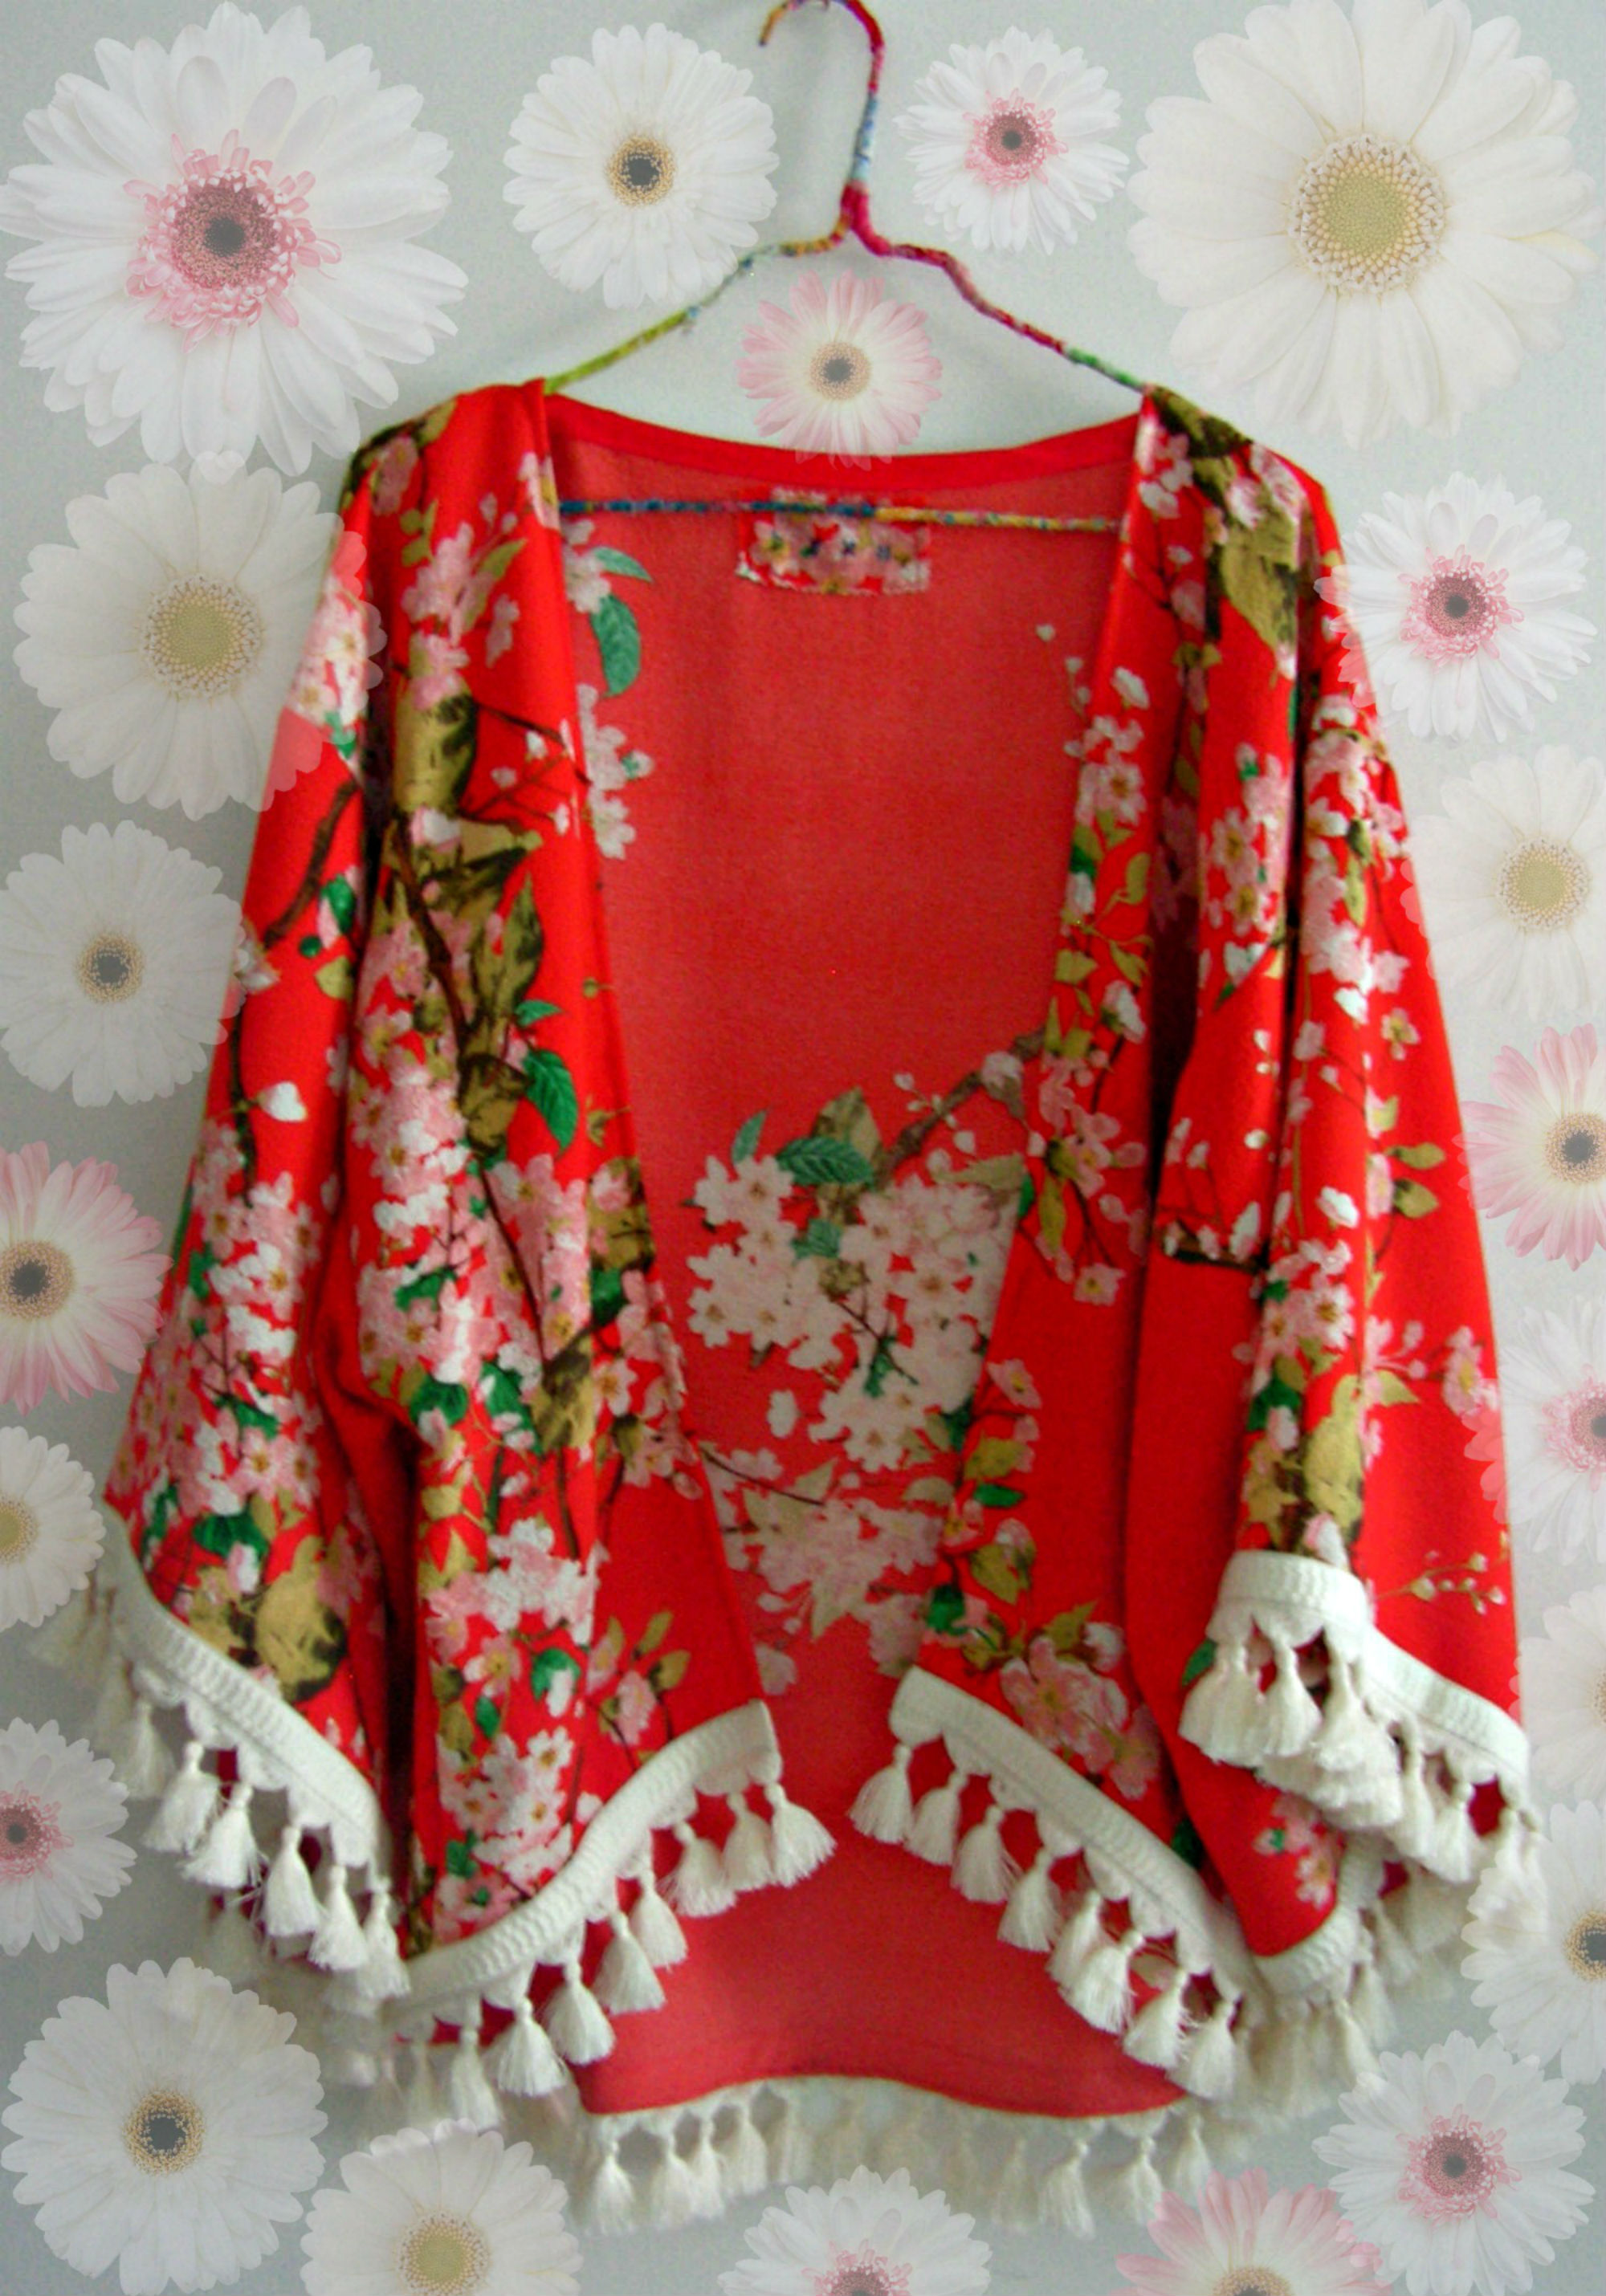 Kimonos Handmade Byxu Byxu Blog